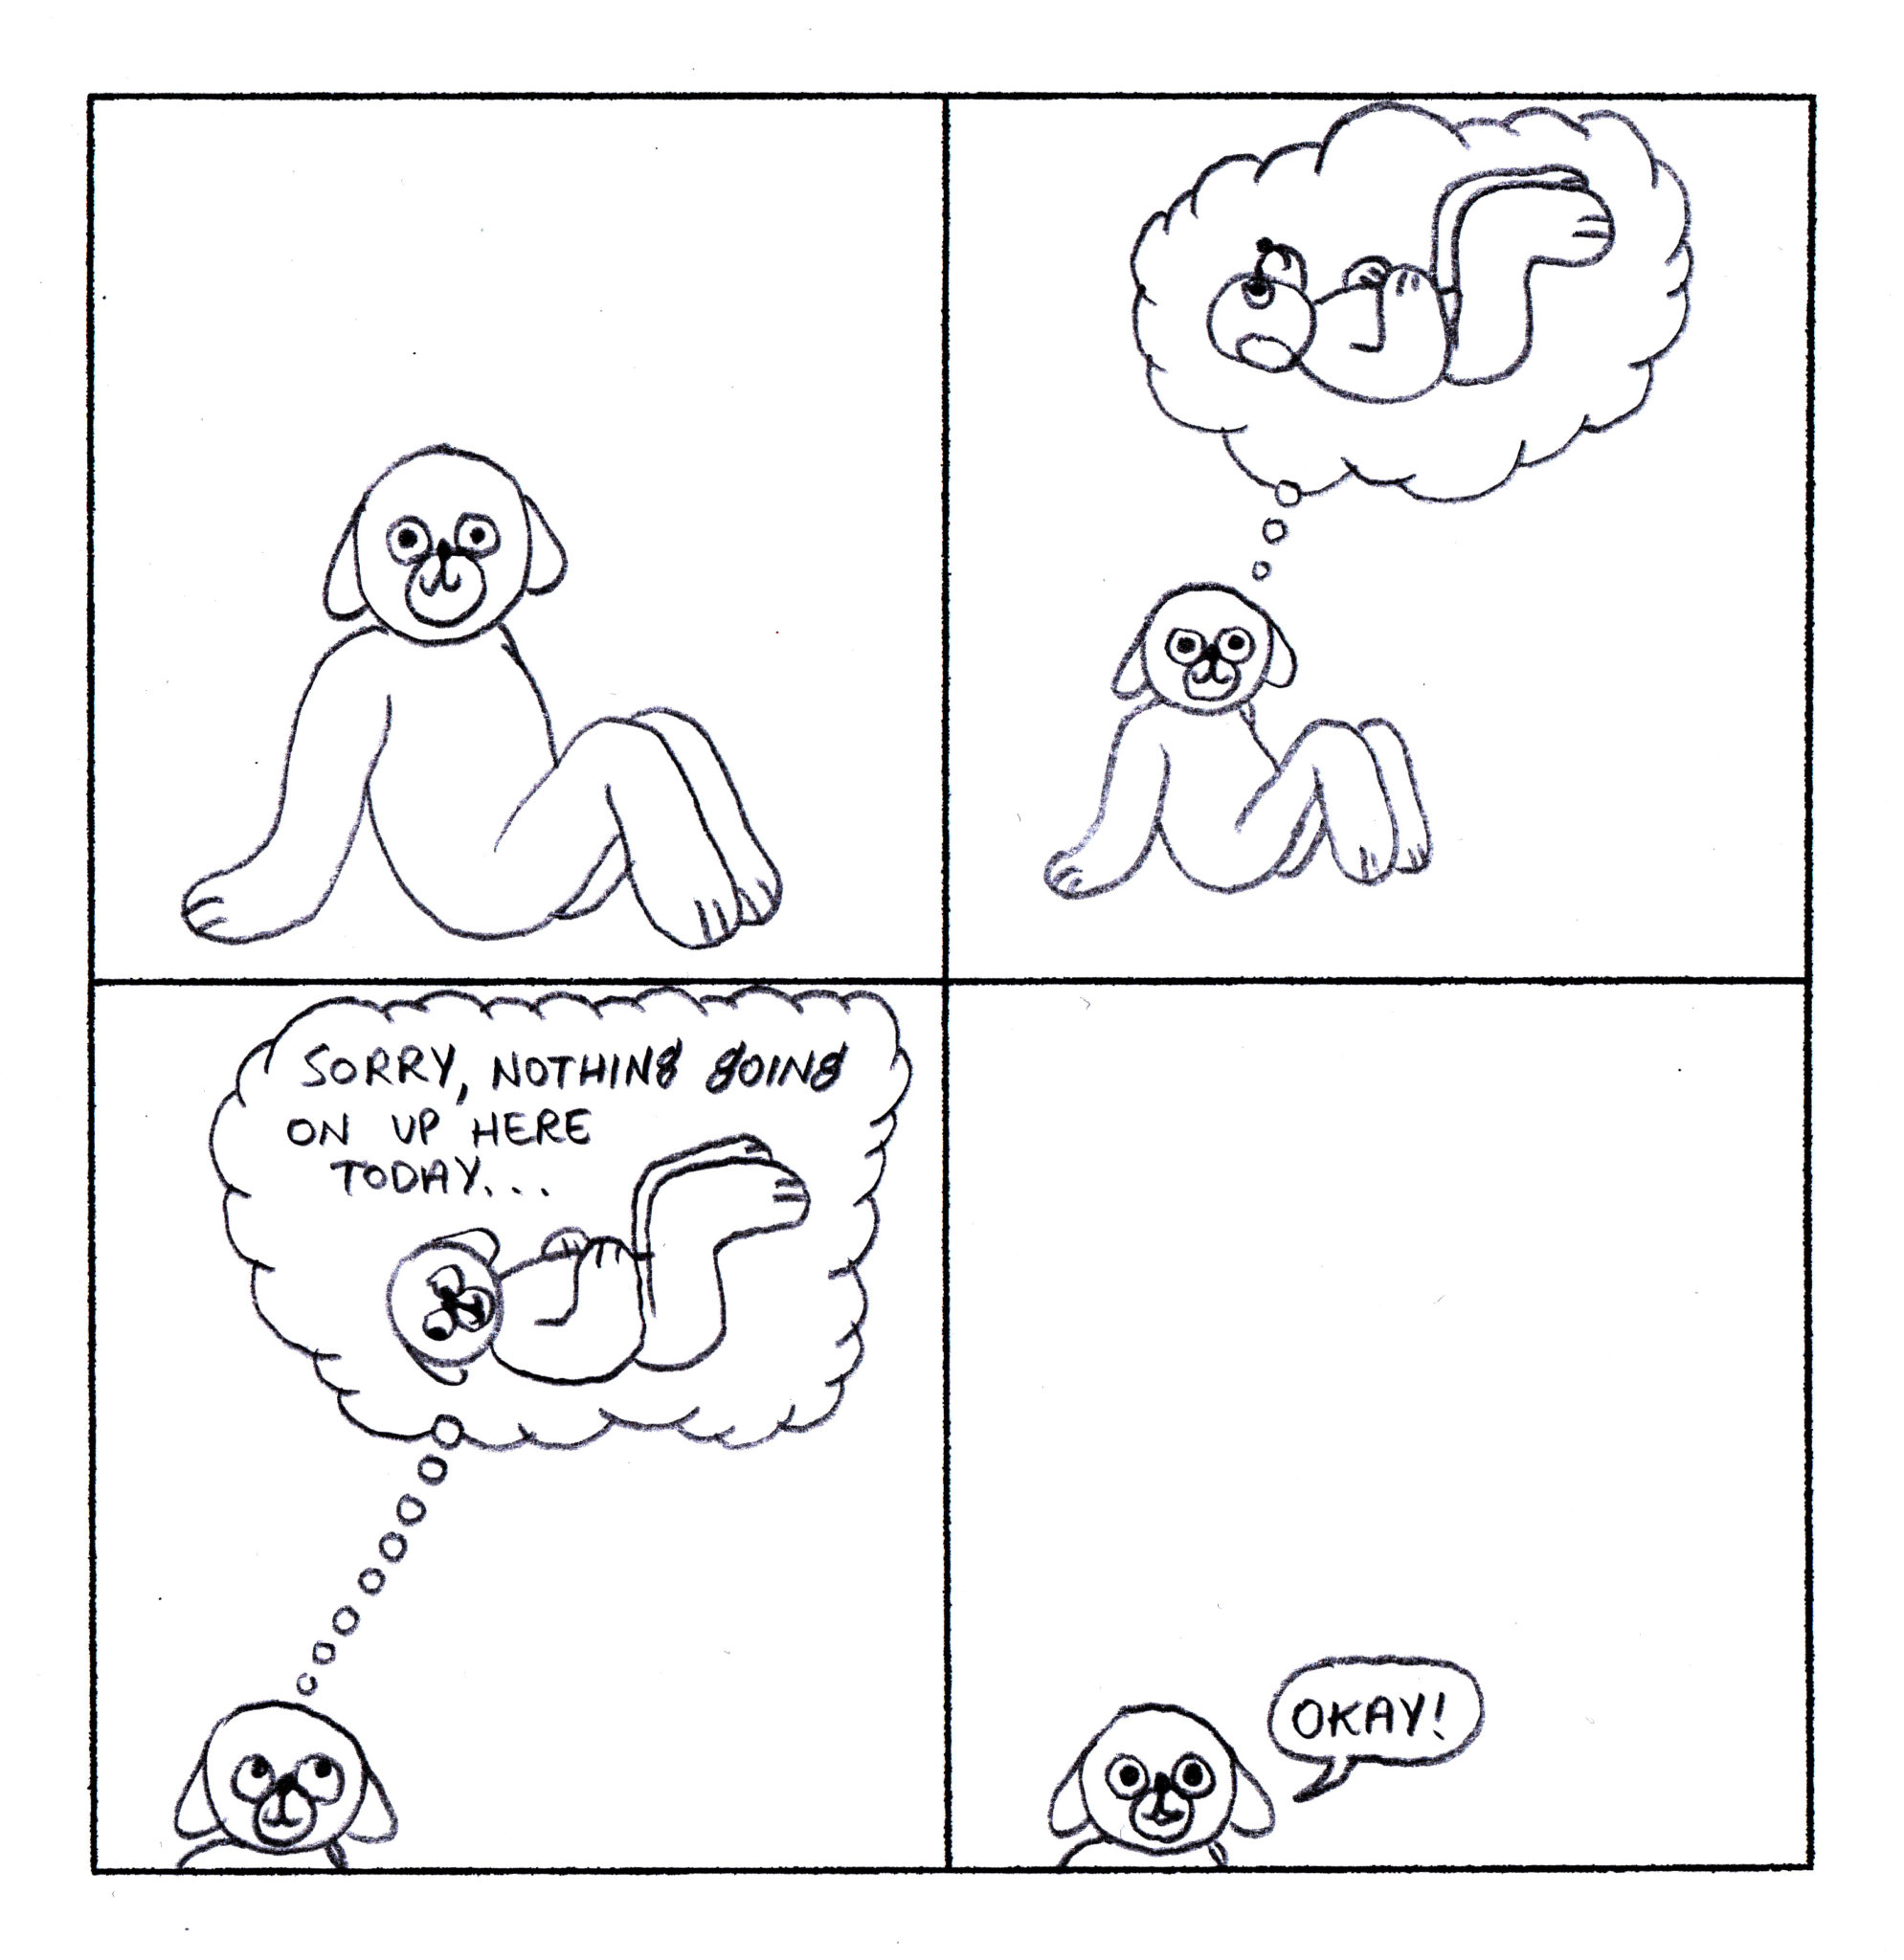 Dog Comics 161-165 - Page 3